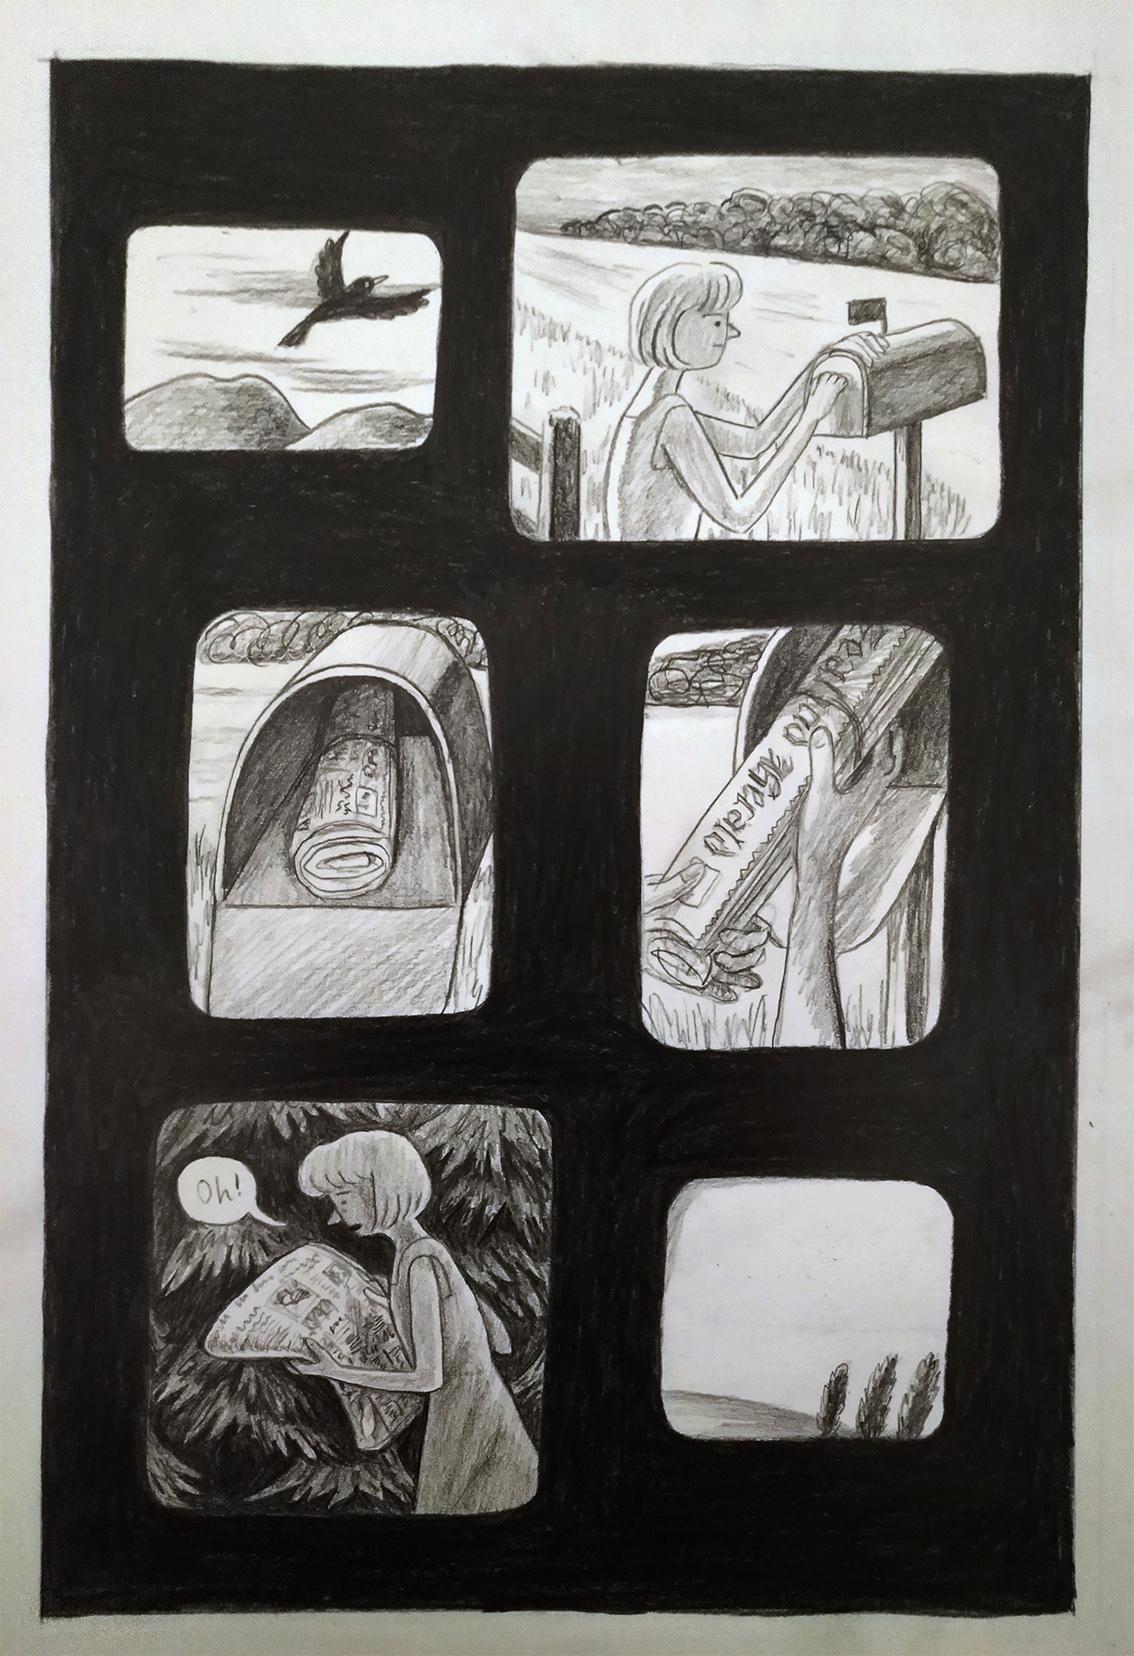 Walter-mum-page2.jpg